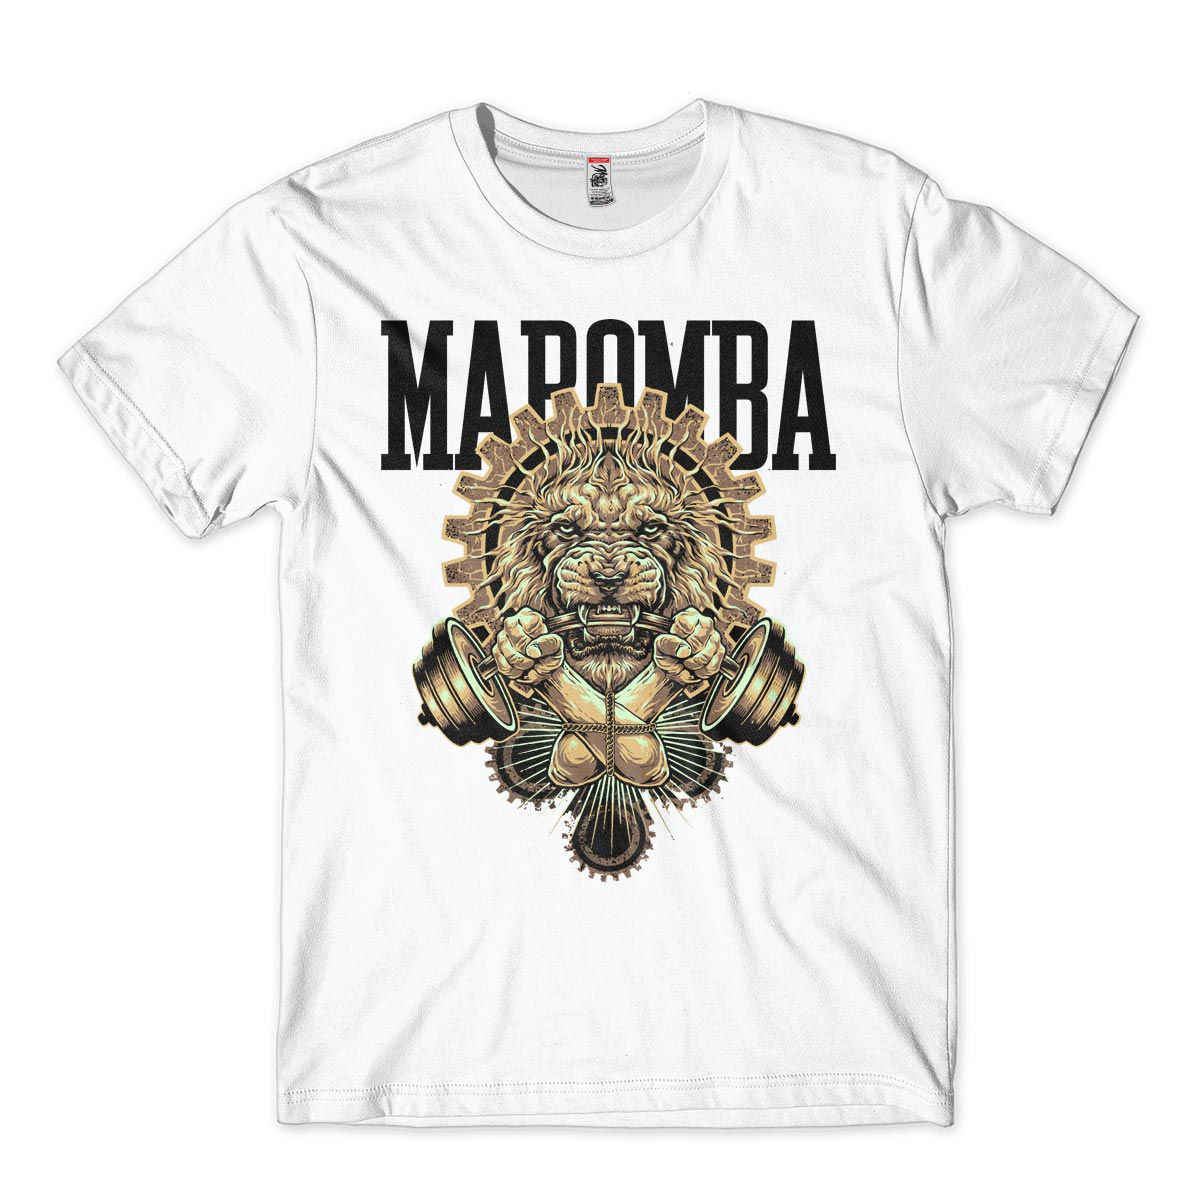 Camiseta de academia Masculina Bodybuilding Leão